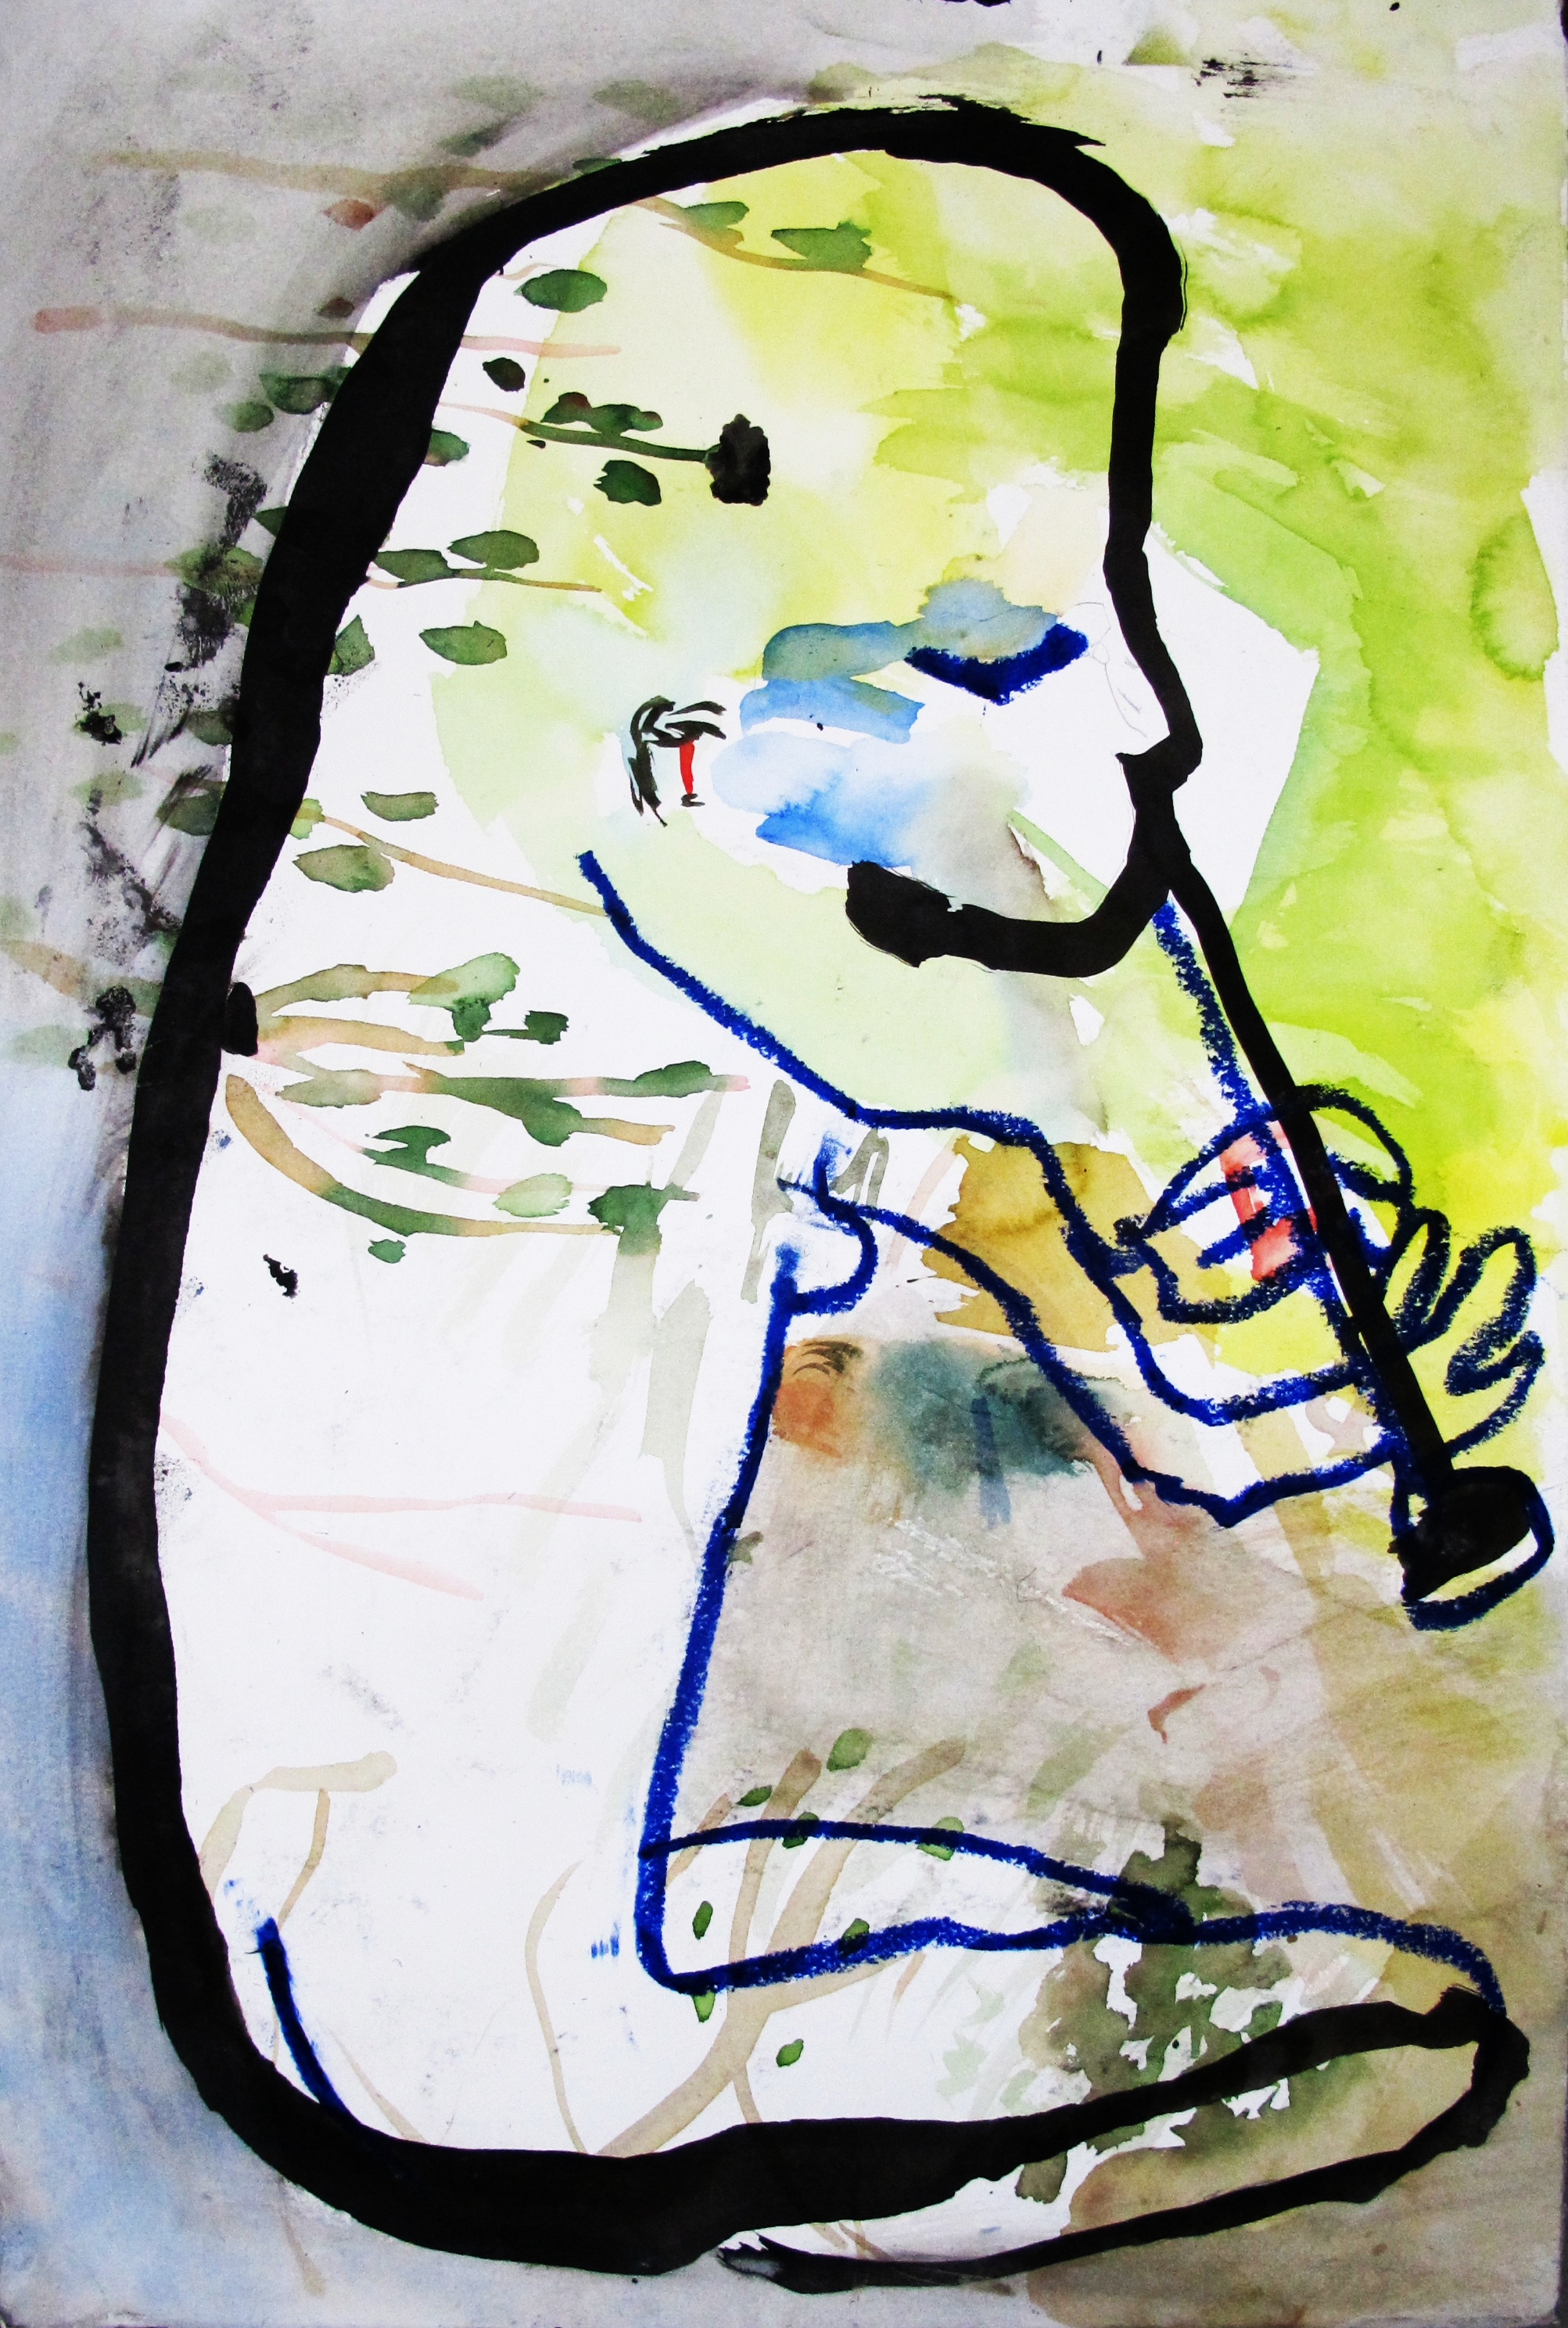 svea+plays+the+flute